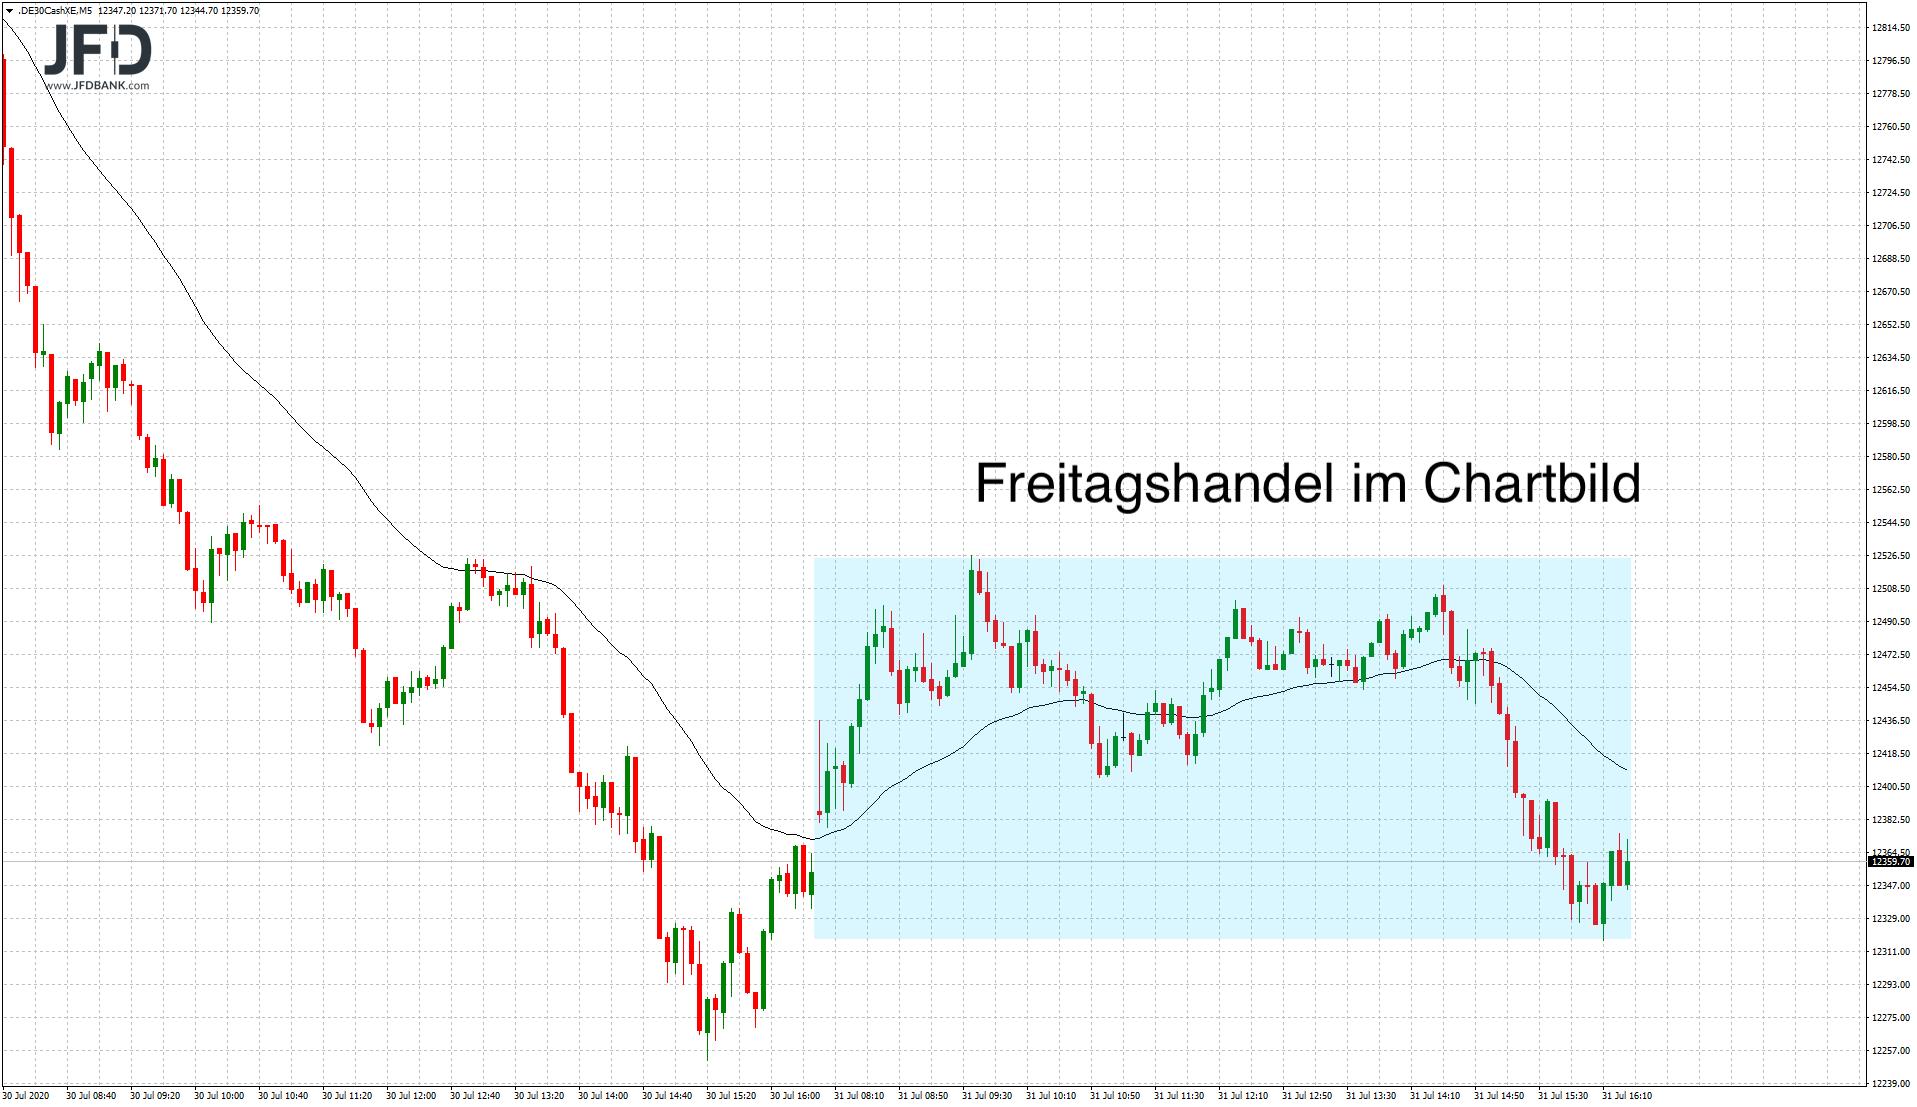 Verhaltener-DAX-Start-in-den-August-Kommentar-JFD-Bank-GodmodeTrader.de-1